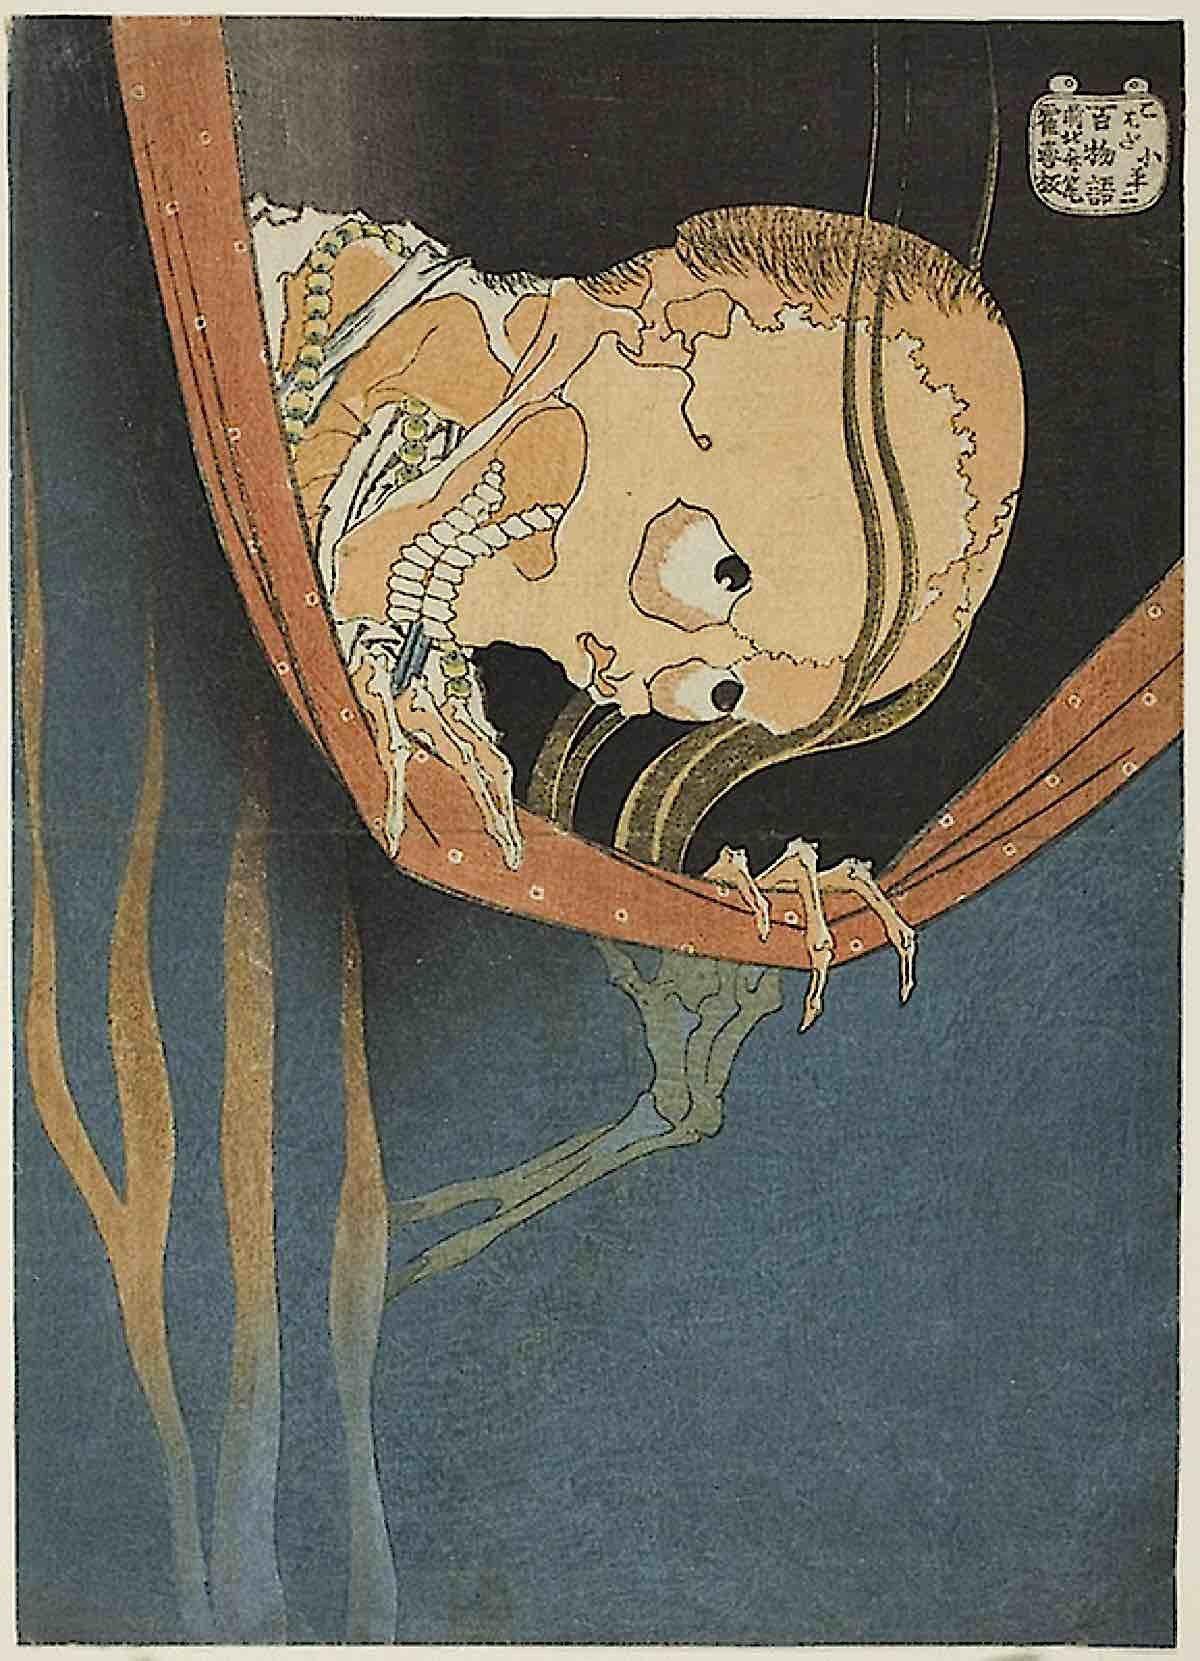 Buddha Weekly Kohada Koheiji one hundred ghost tales Buddhism